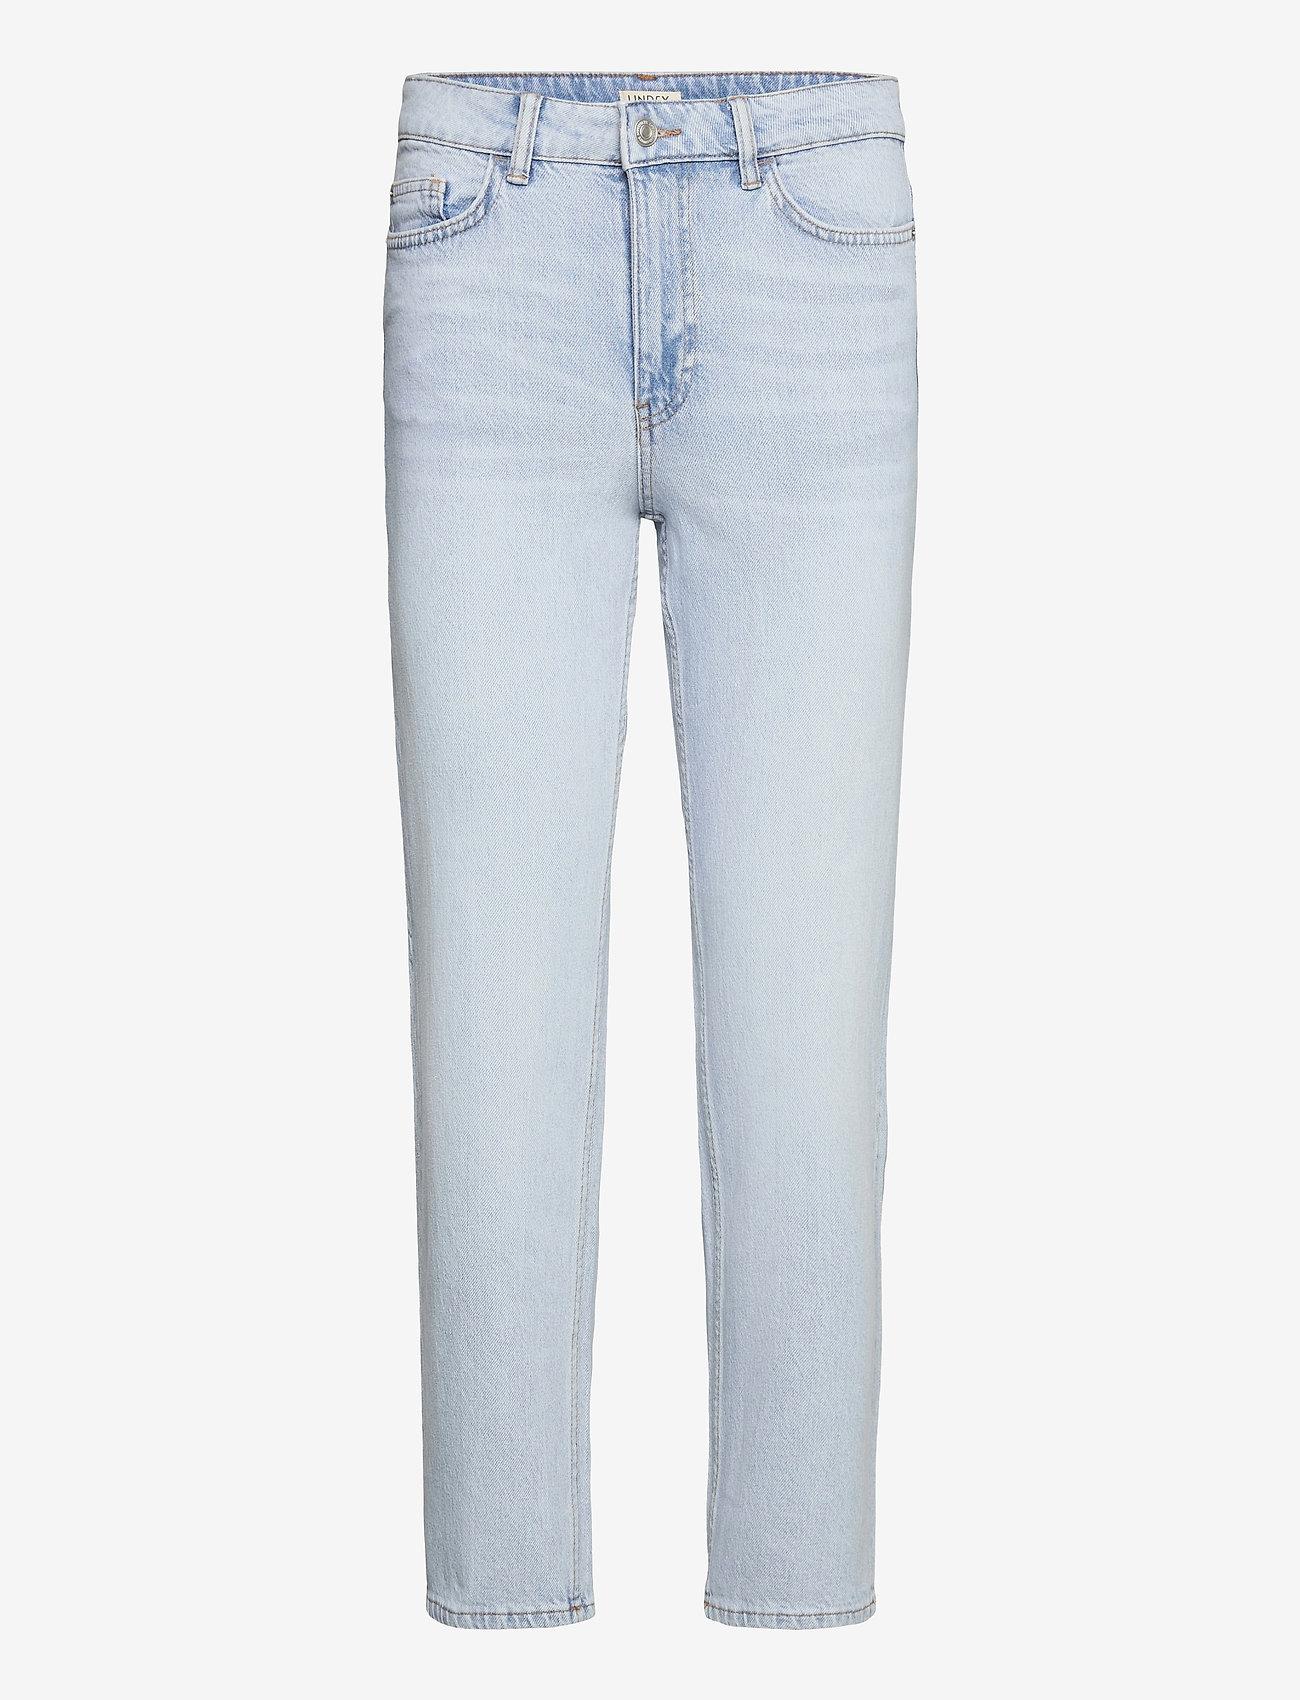 Lindex - Denim trousers Nea light blue - straight regular - blue - 0